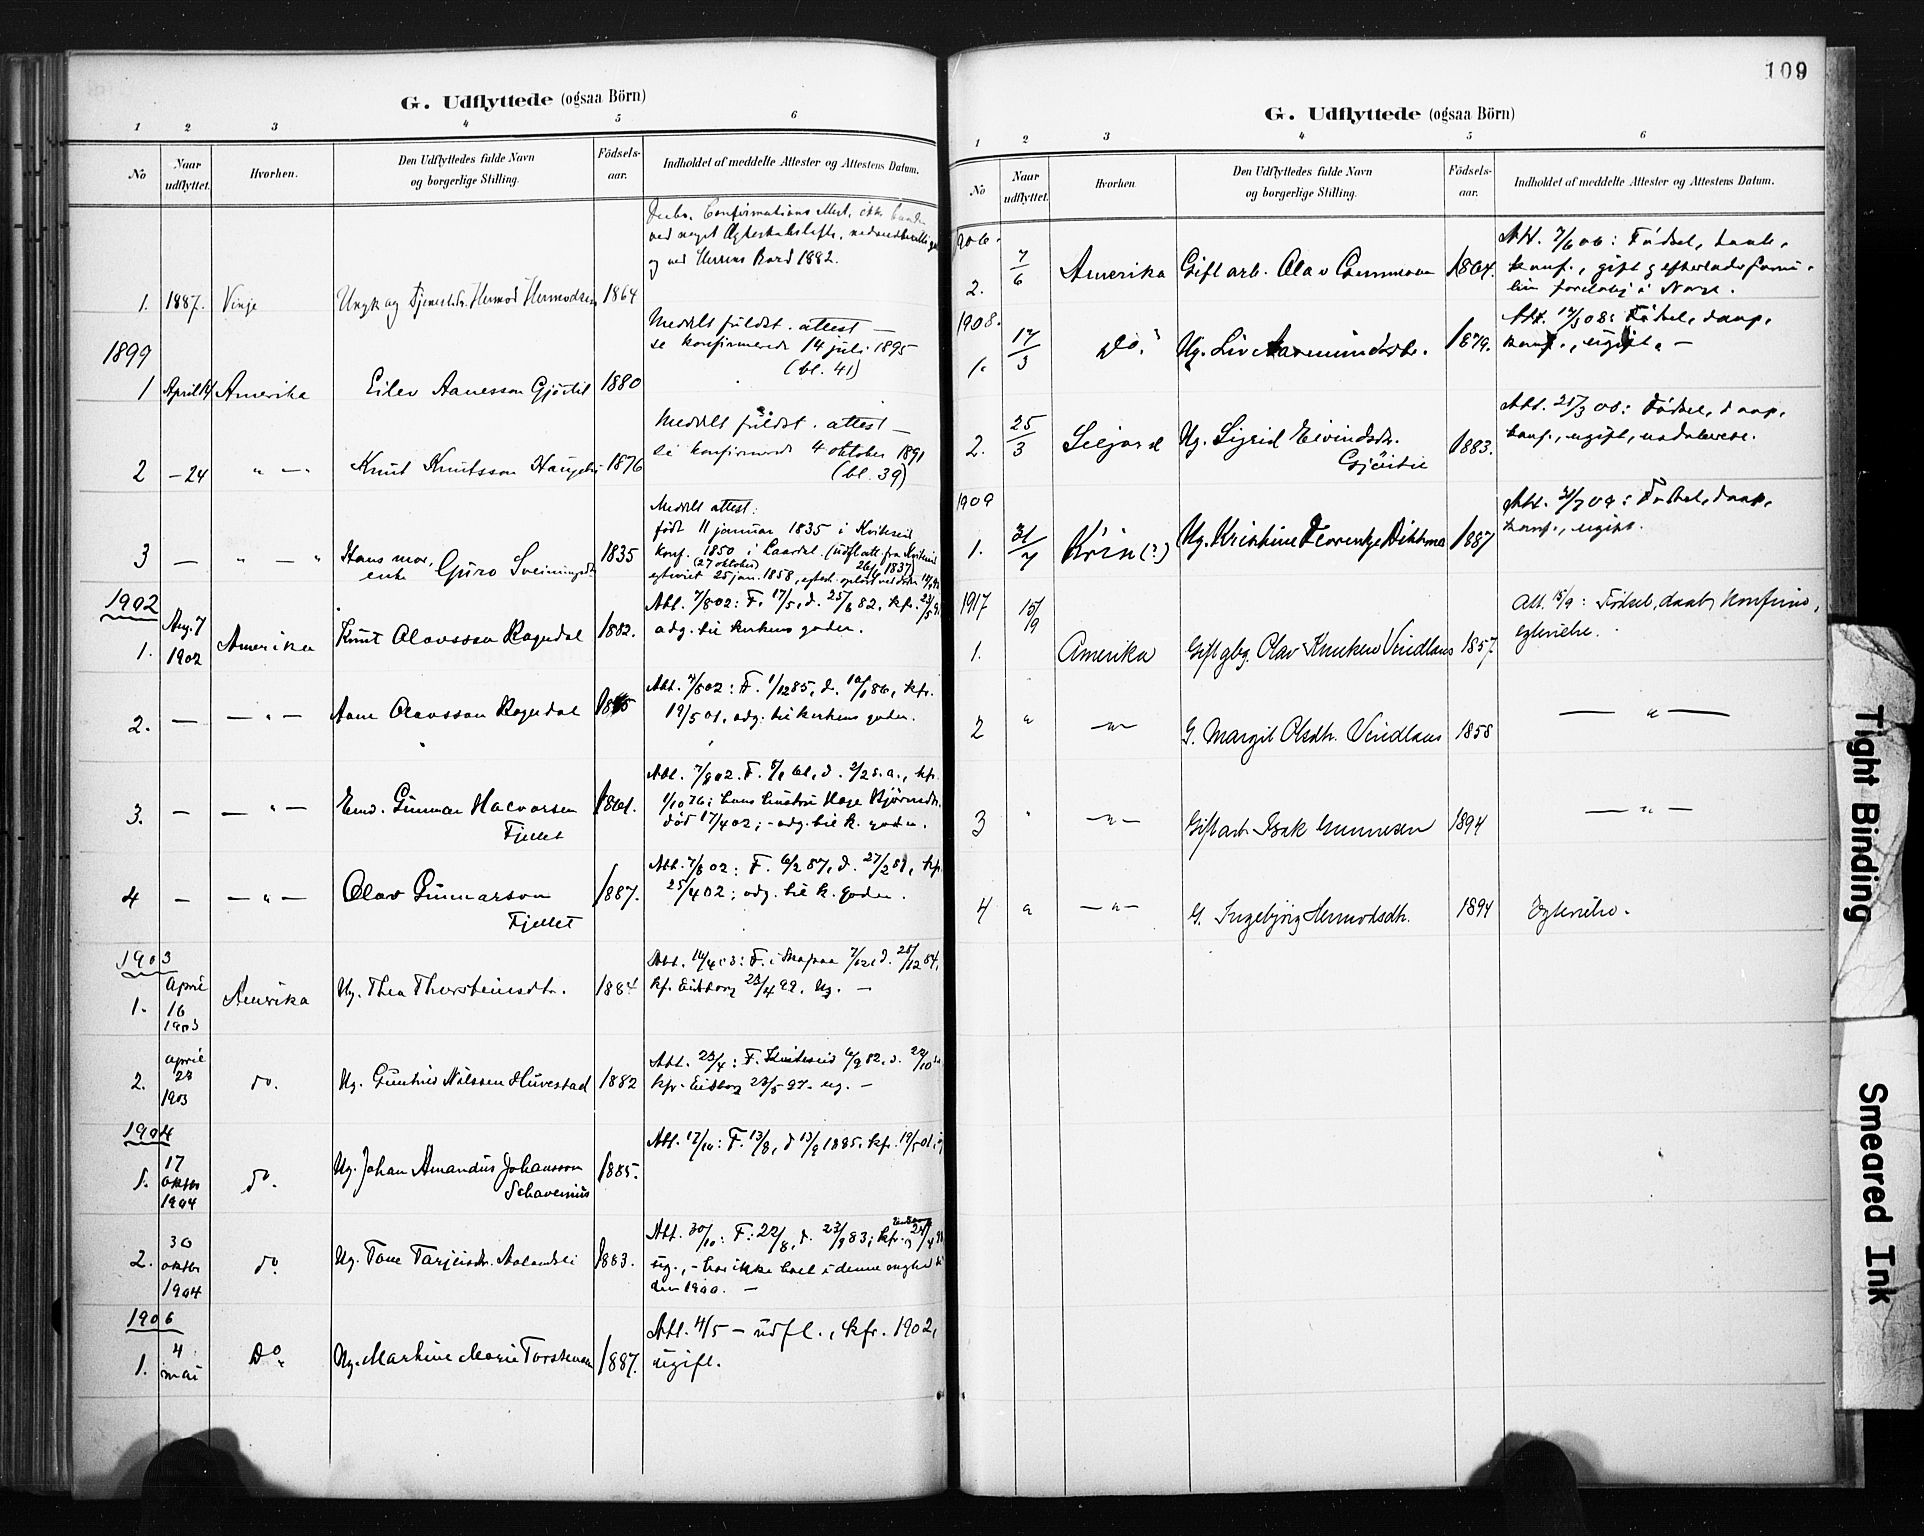 SAKO, Lårdal kirkebøker, F/Fb/L0002: Ministerialbok nr. II 2, 1887-1918, s. 109